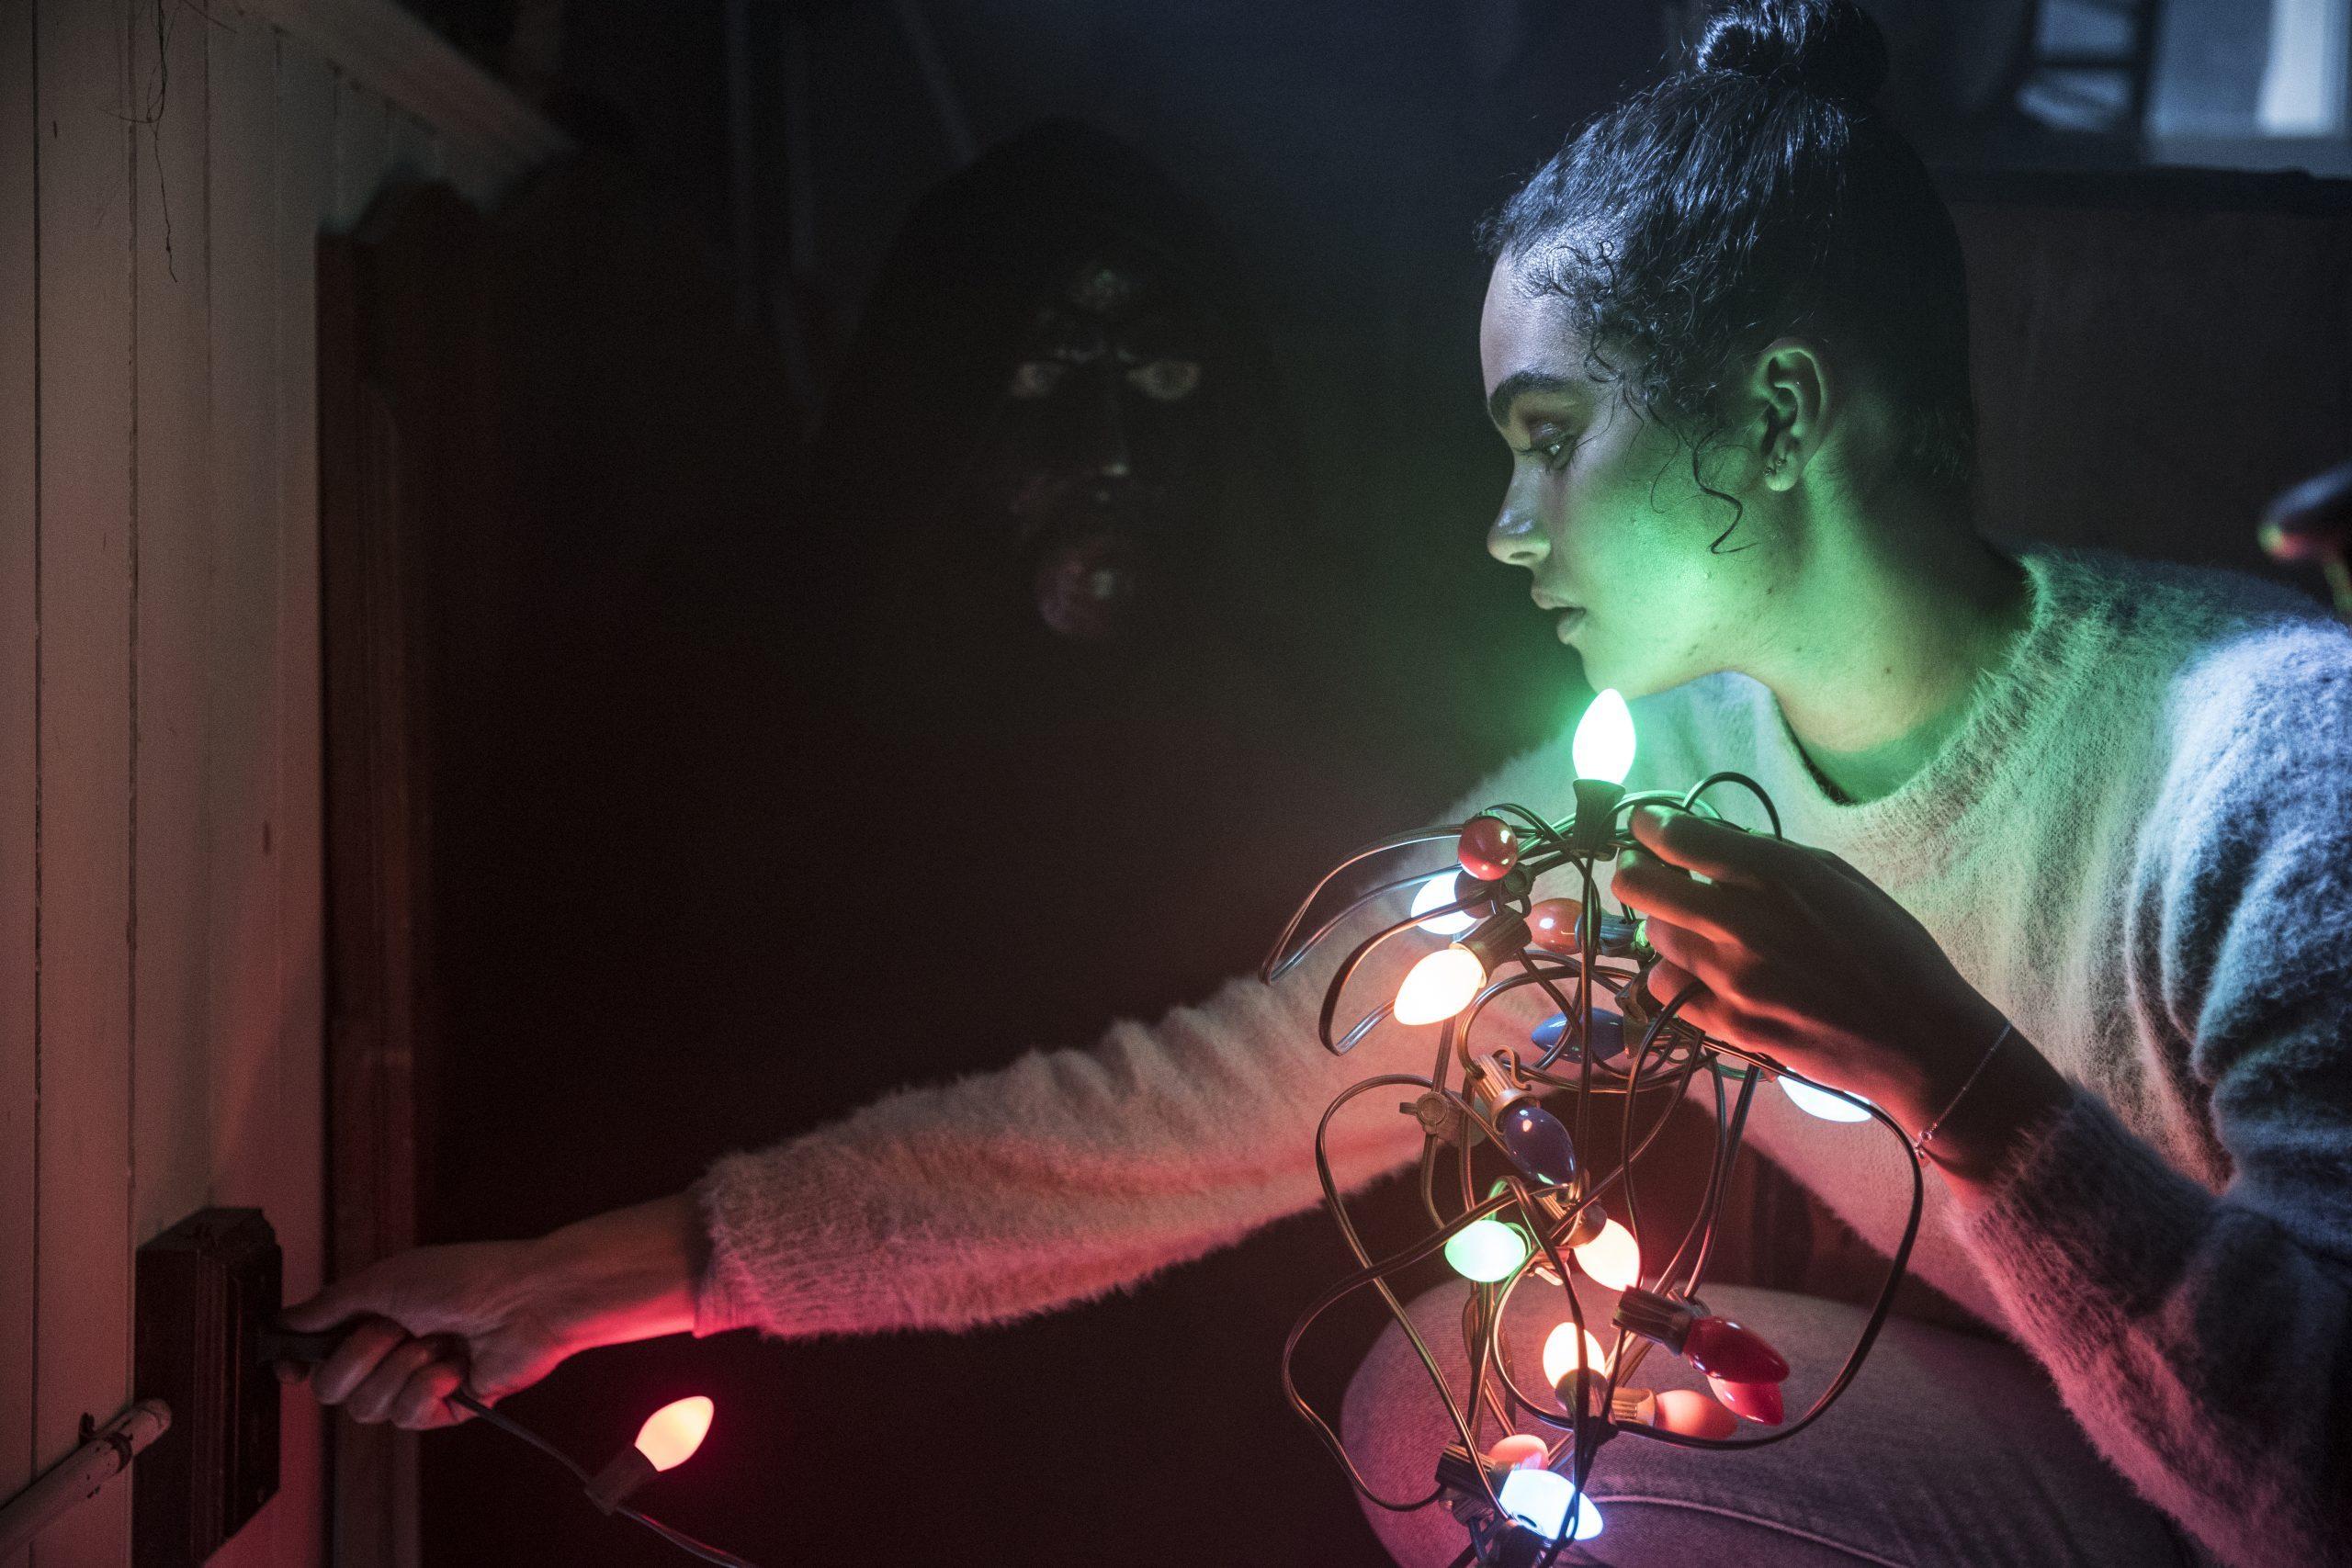 Brittany O'Grady, Black Christmas, Blumhouse